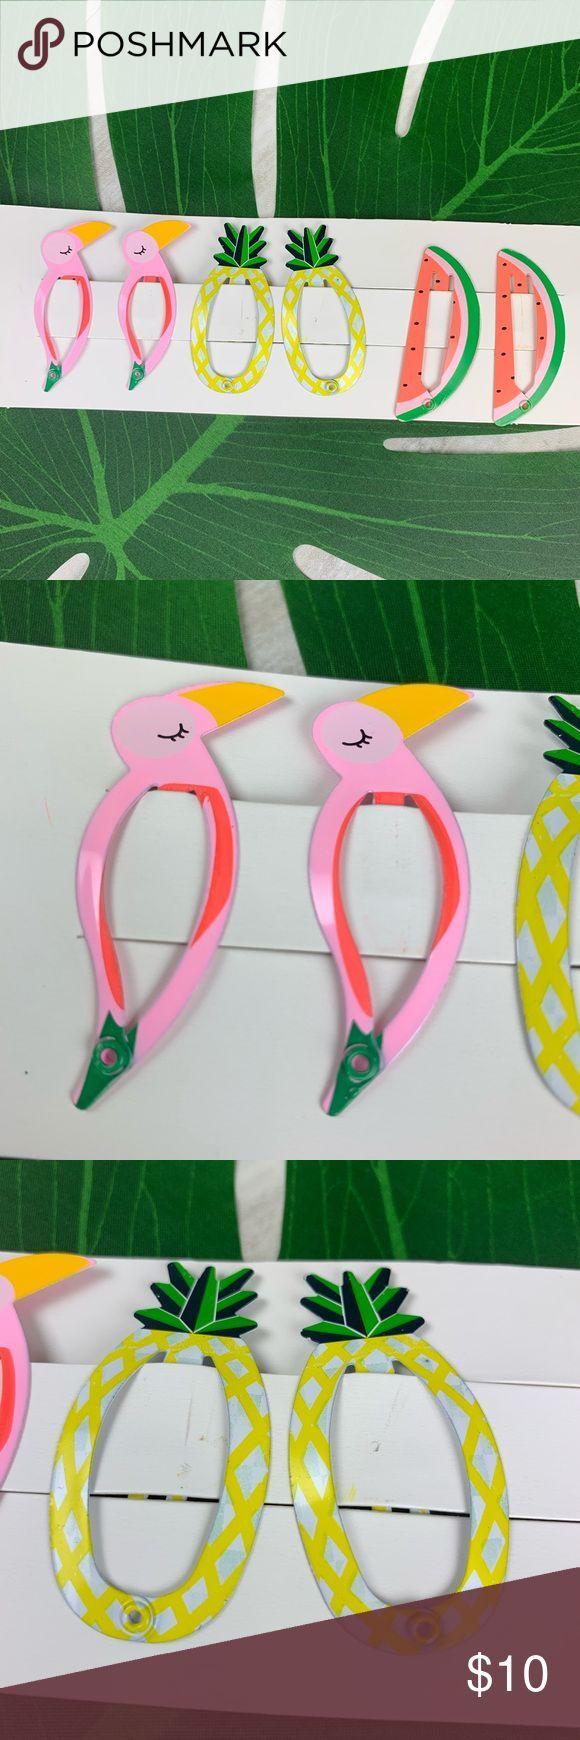 Set of 6 Little Girls Tropical Themed Hair Clips Set of 6 Little Girls Tropical ...   - My Posh Closet -